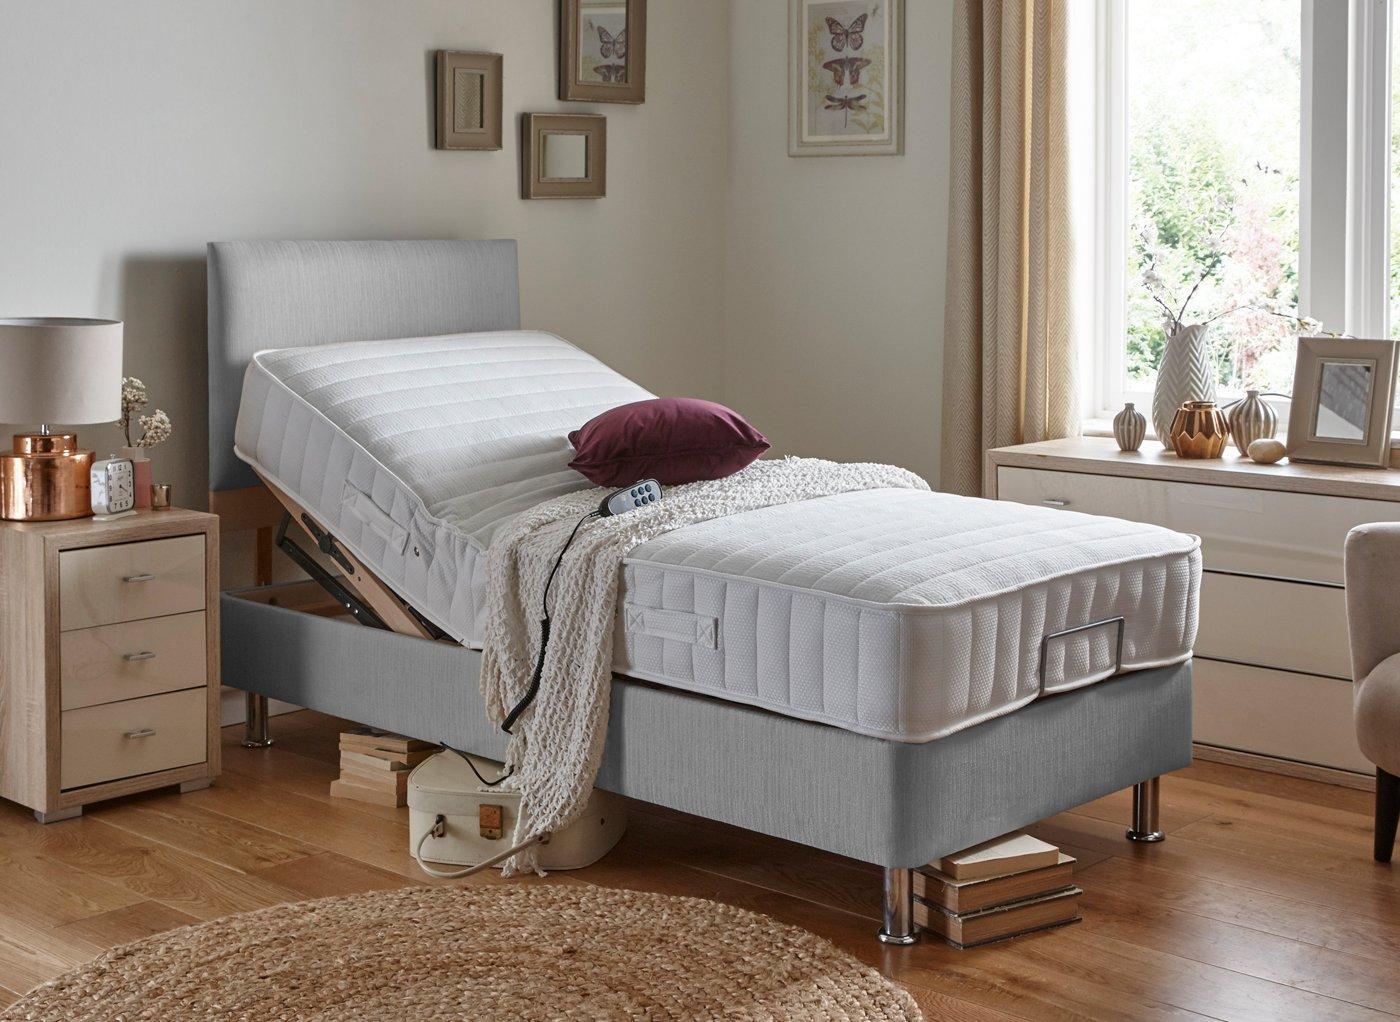 Danson Mattress With Standard Grey Adjustable Divan Bed - Medium 3'0 Single